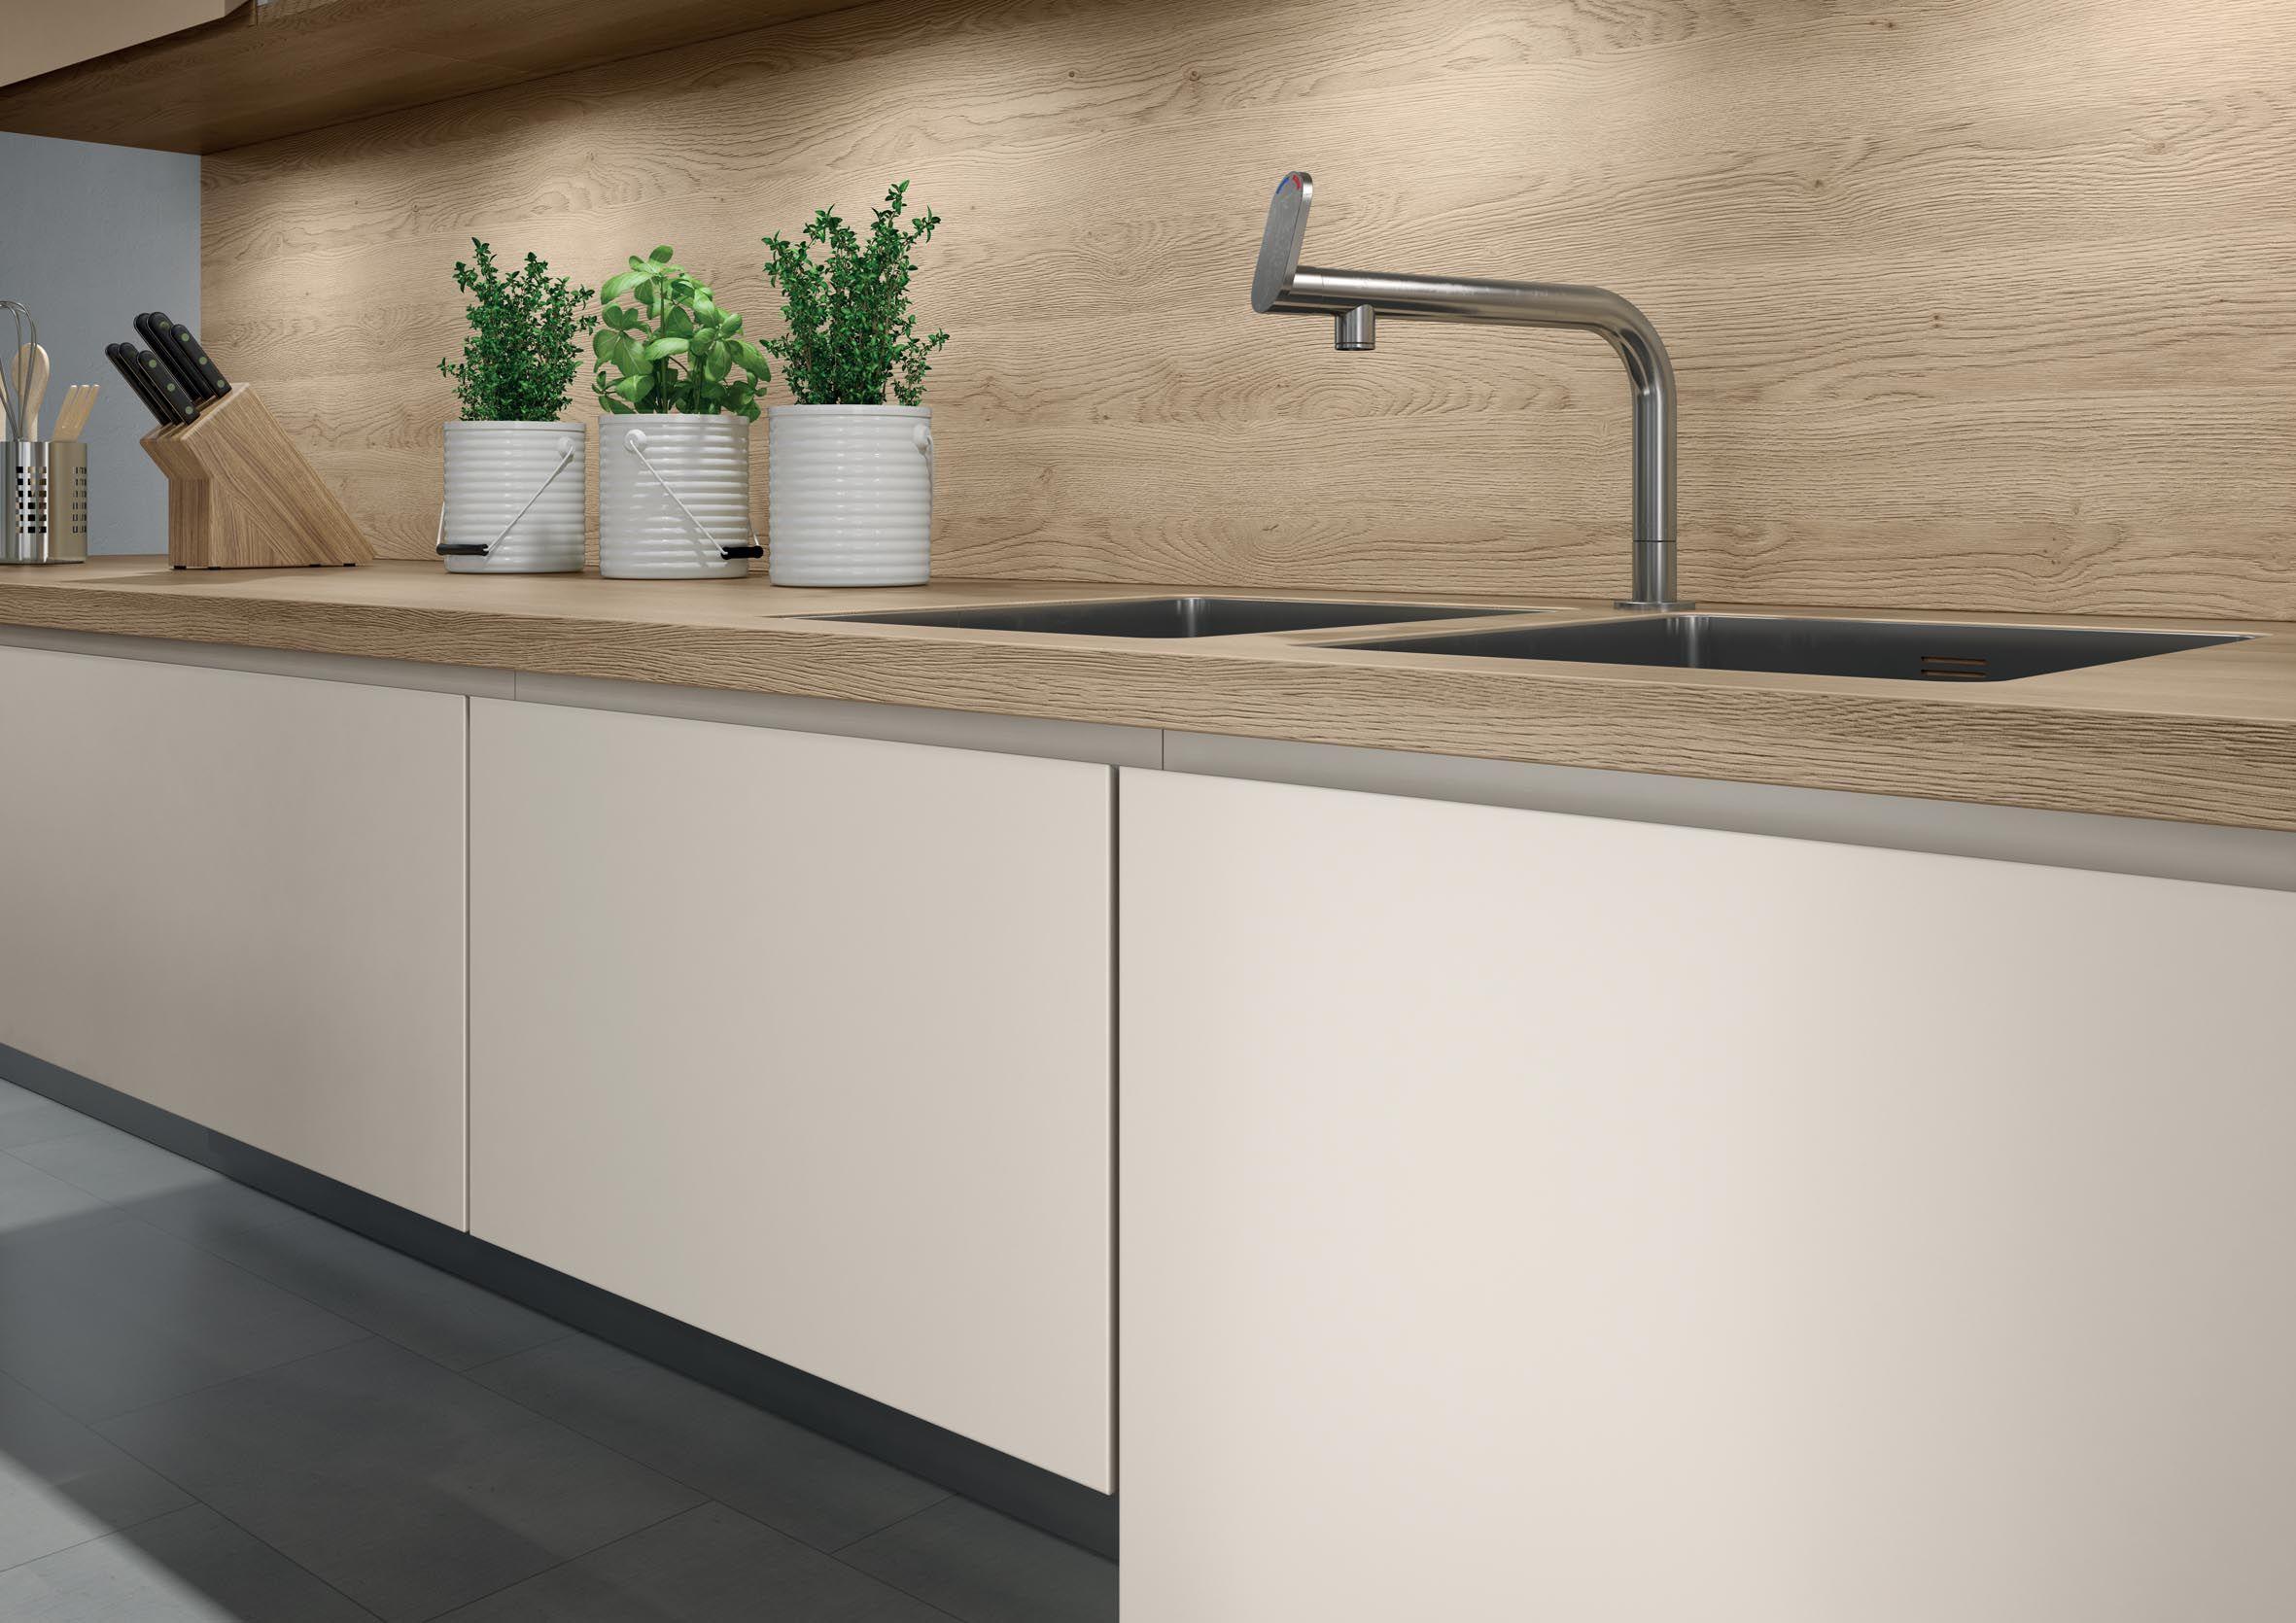 found on the kitchen bathroom blog australia perfectsense matt